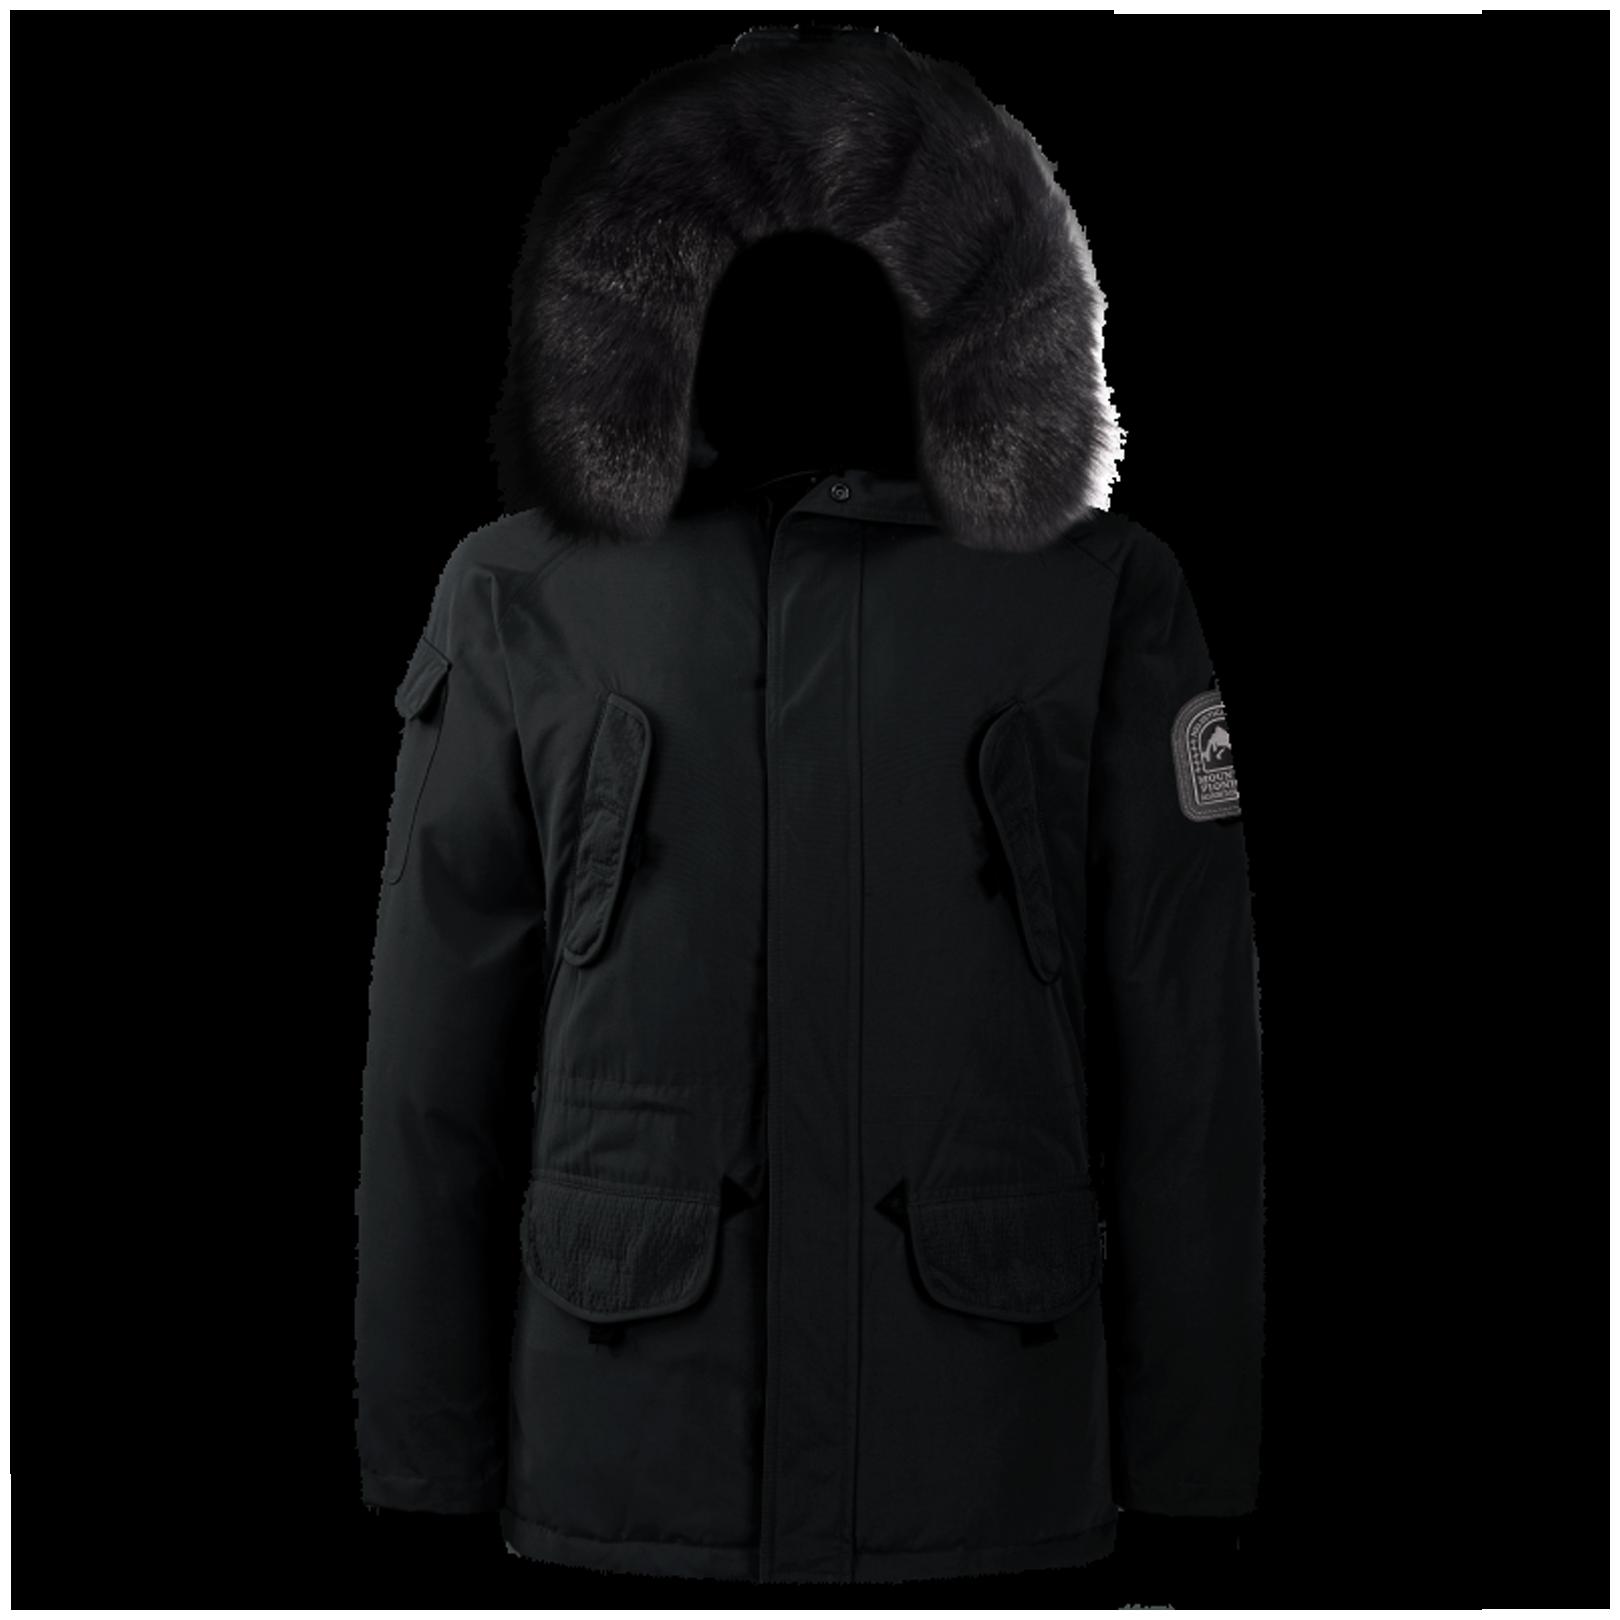 Parka Helvetica Expedition Men Black Edition Noir